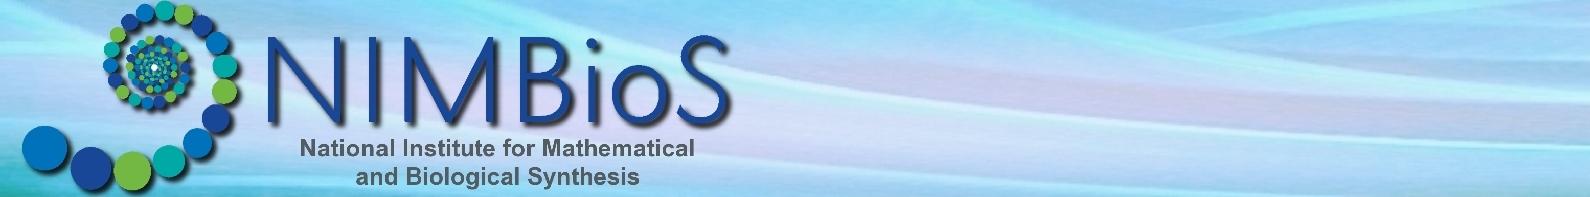 NIMBioS logo banner.